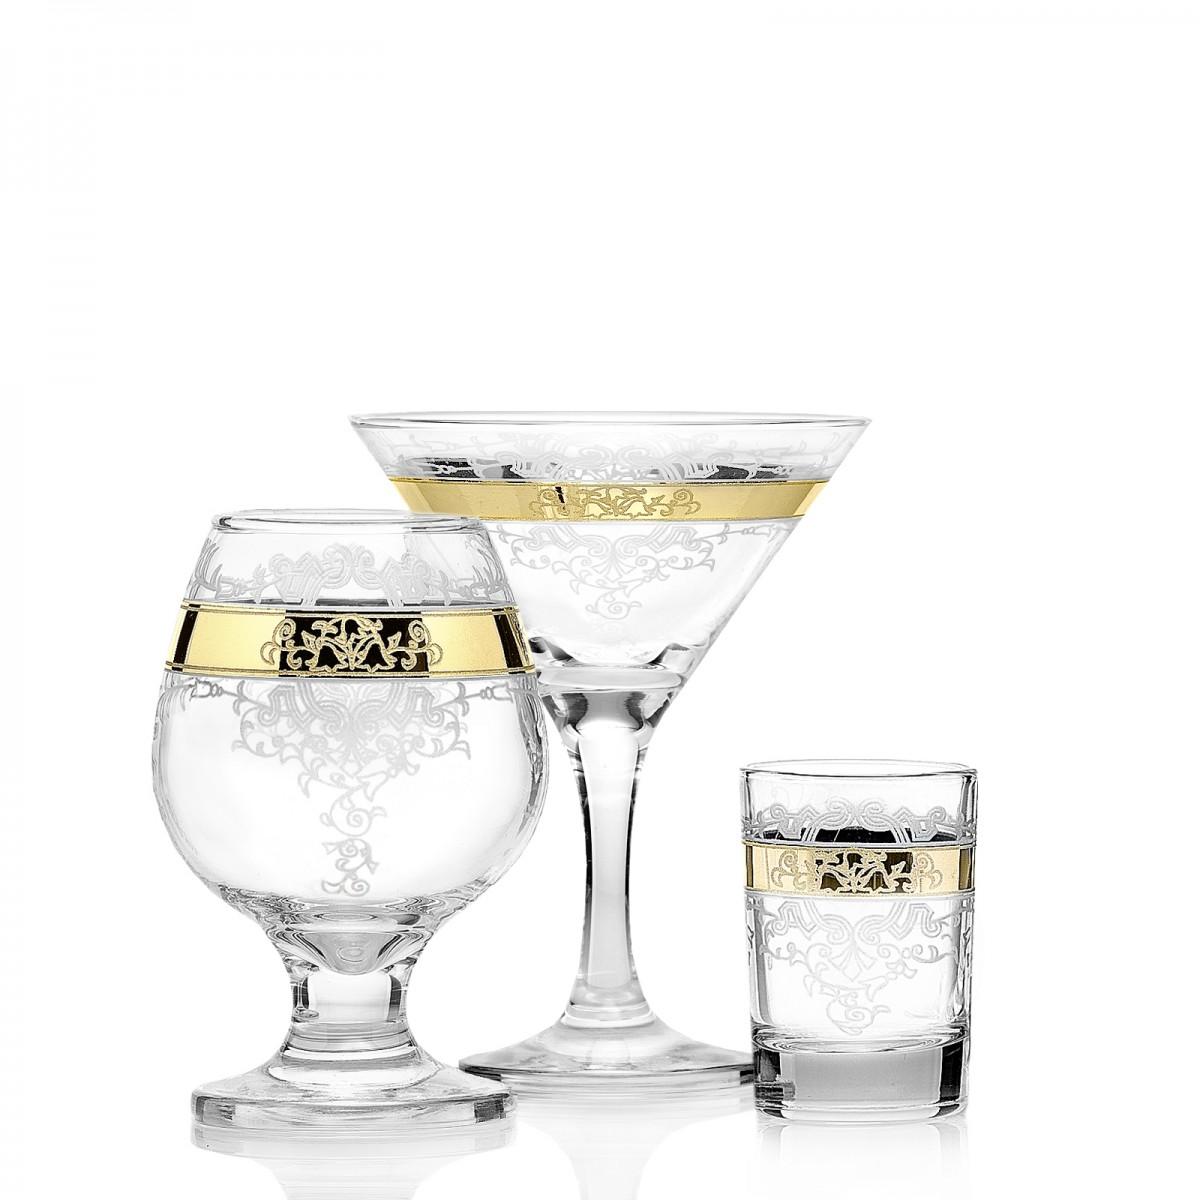 GN13_410_1740_50 Набор 18 предметов «Медальон» (6 мартини + 6 бокалов бренди + 6 стопок)